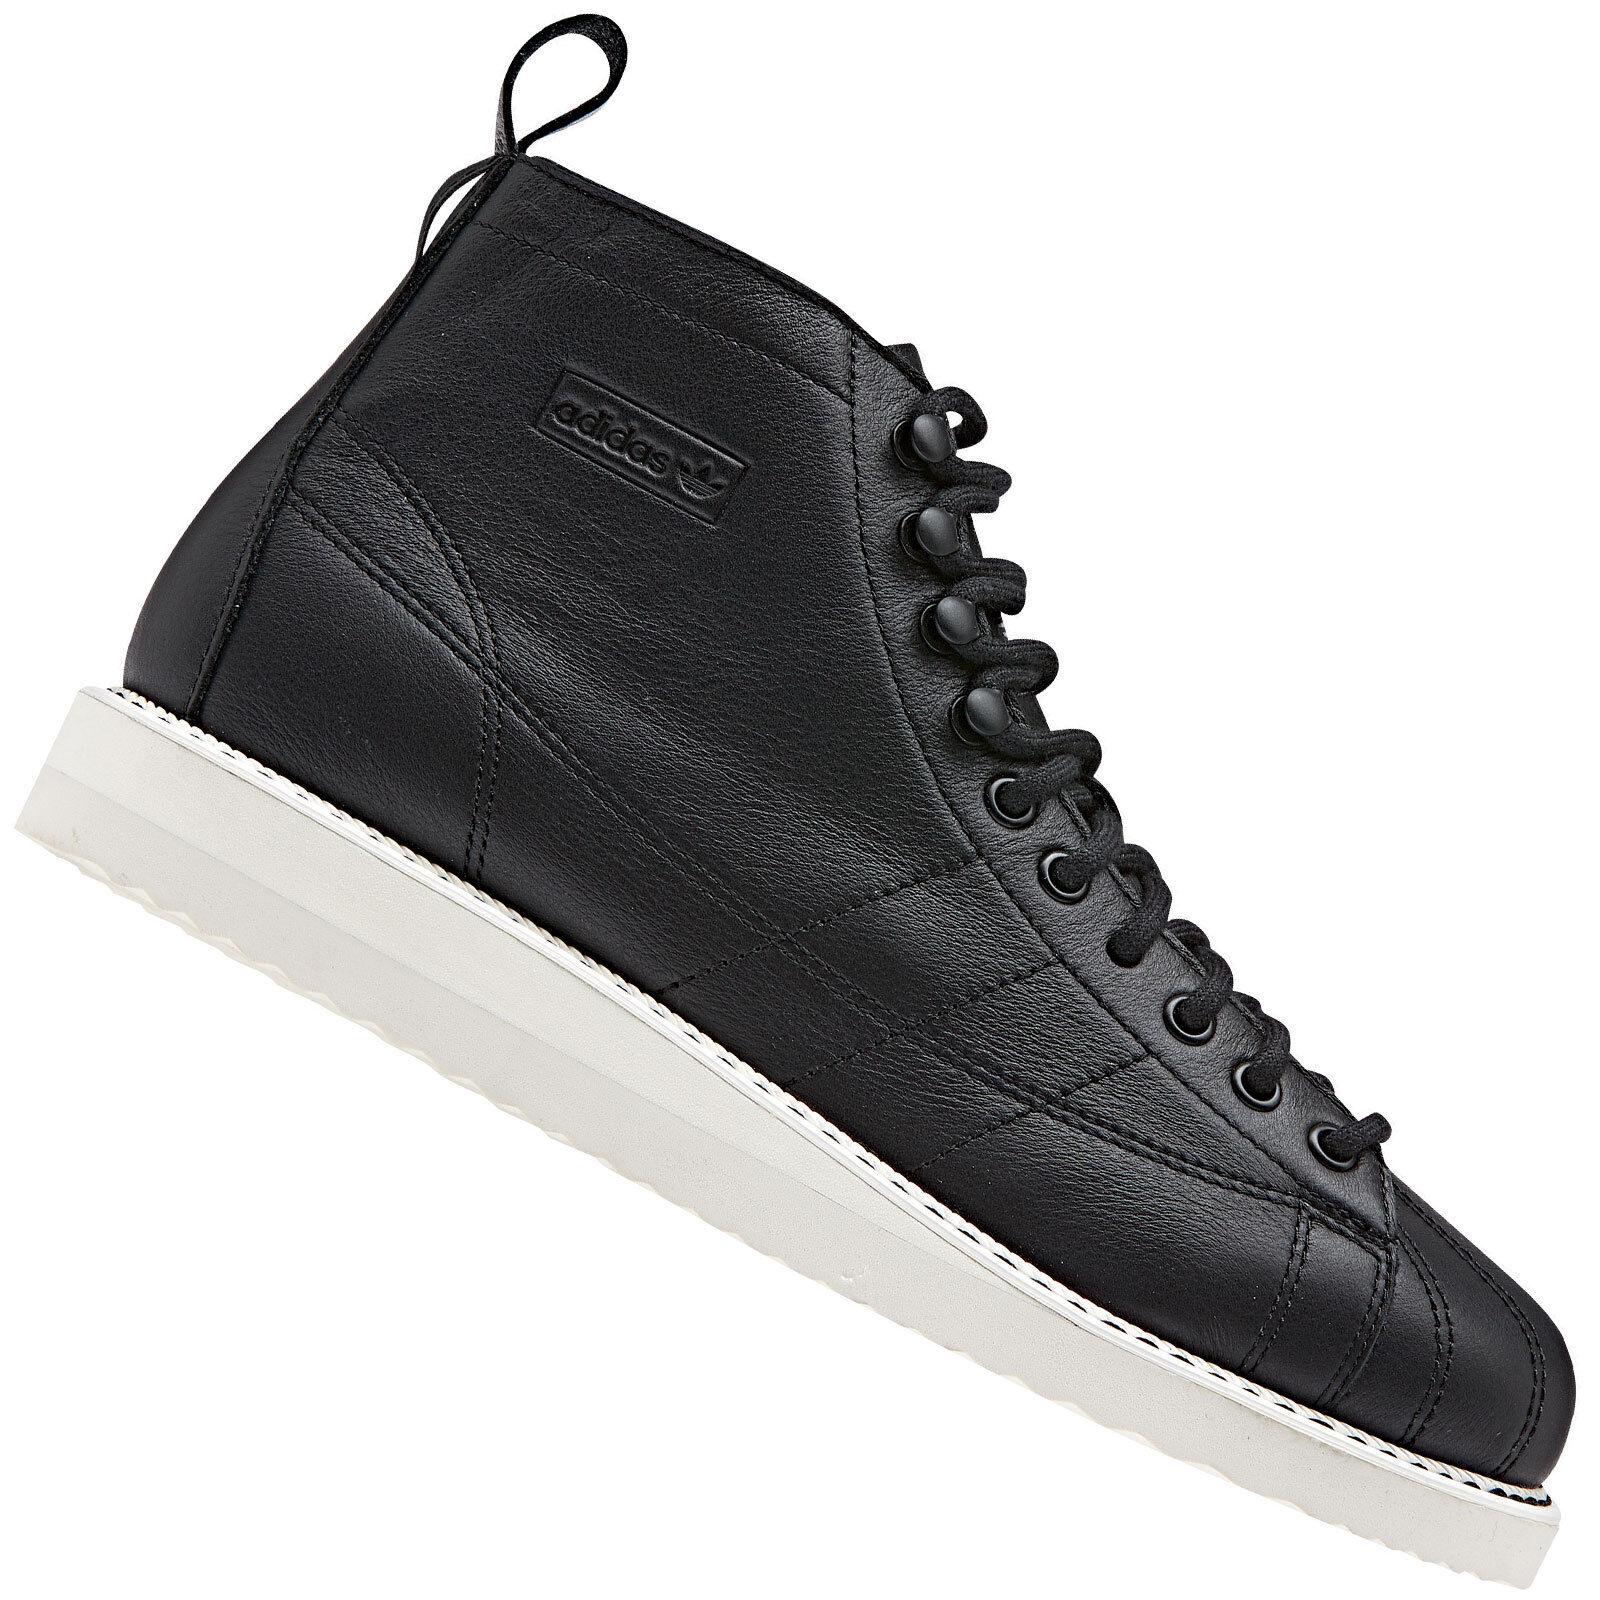 Adidas Originals SUPERSTAR démarrage Femmes Hiver Chaussures D'Hiver bottes Chaussure Chaussure Chaussure Lacée NEUF 1a2ad8